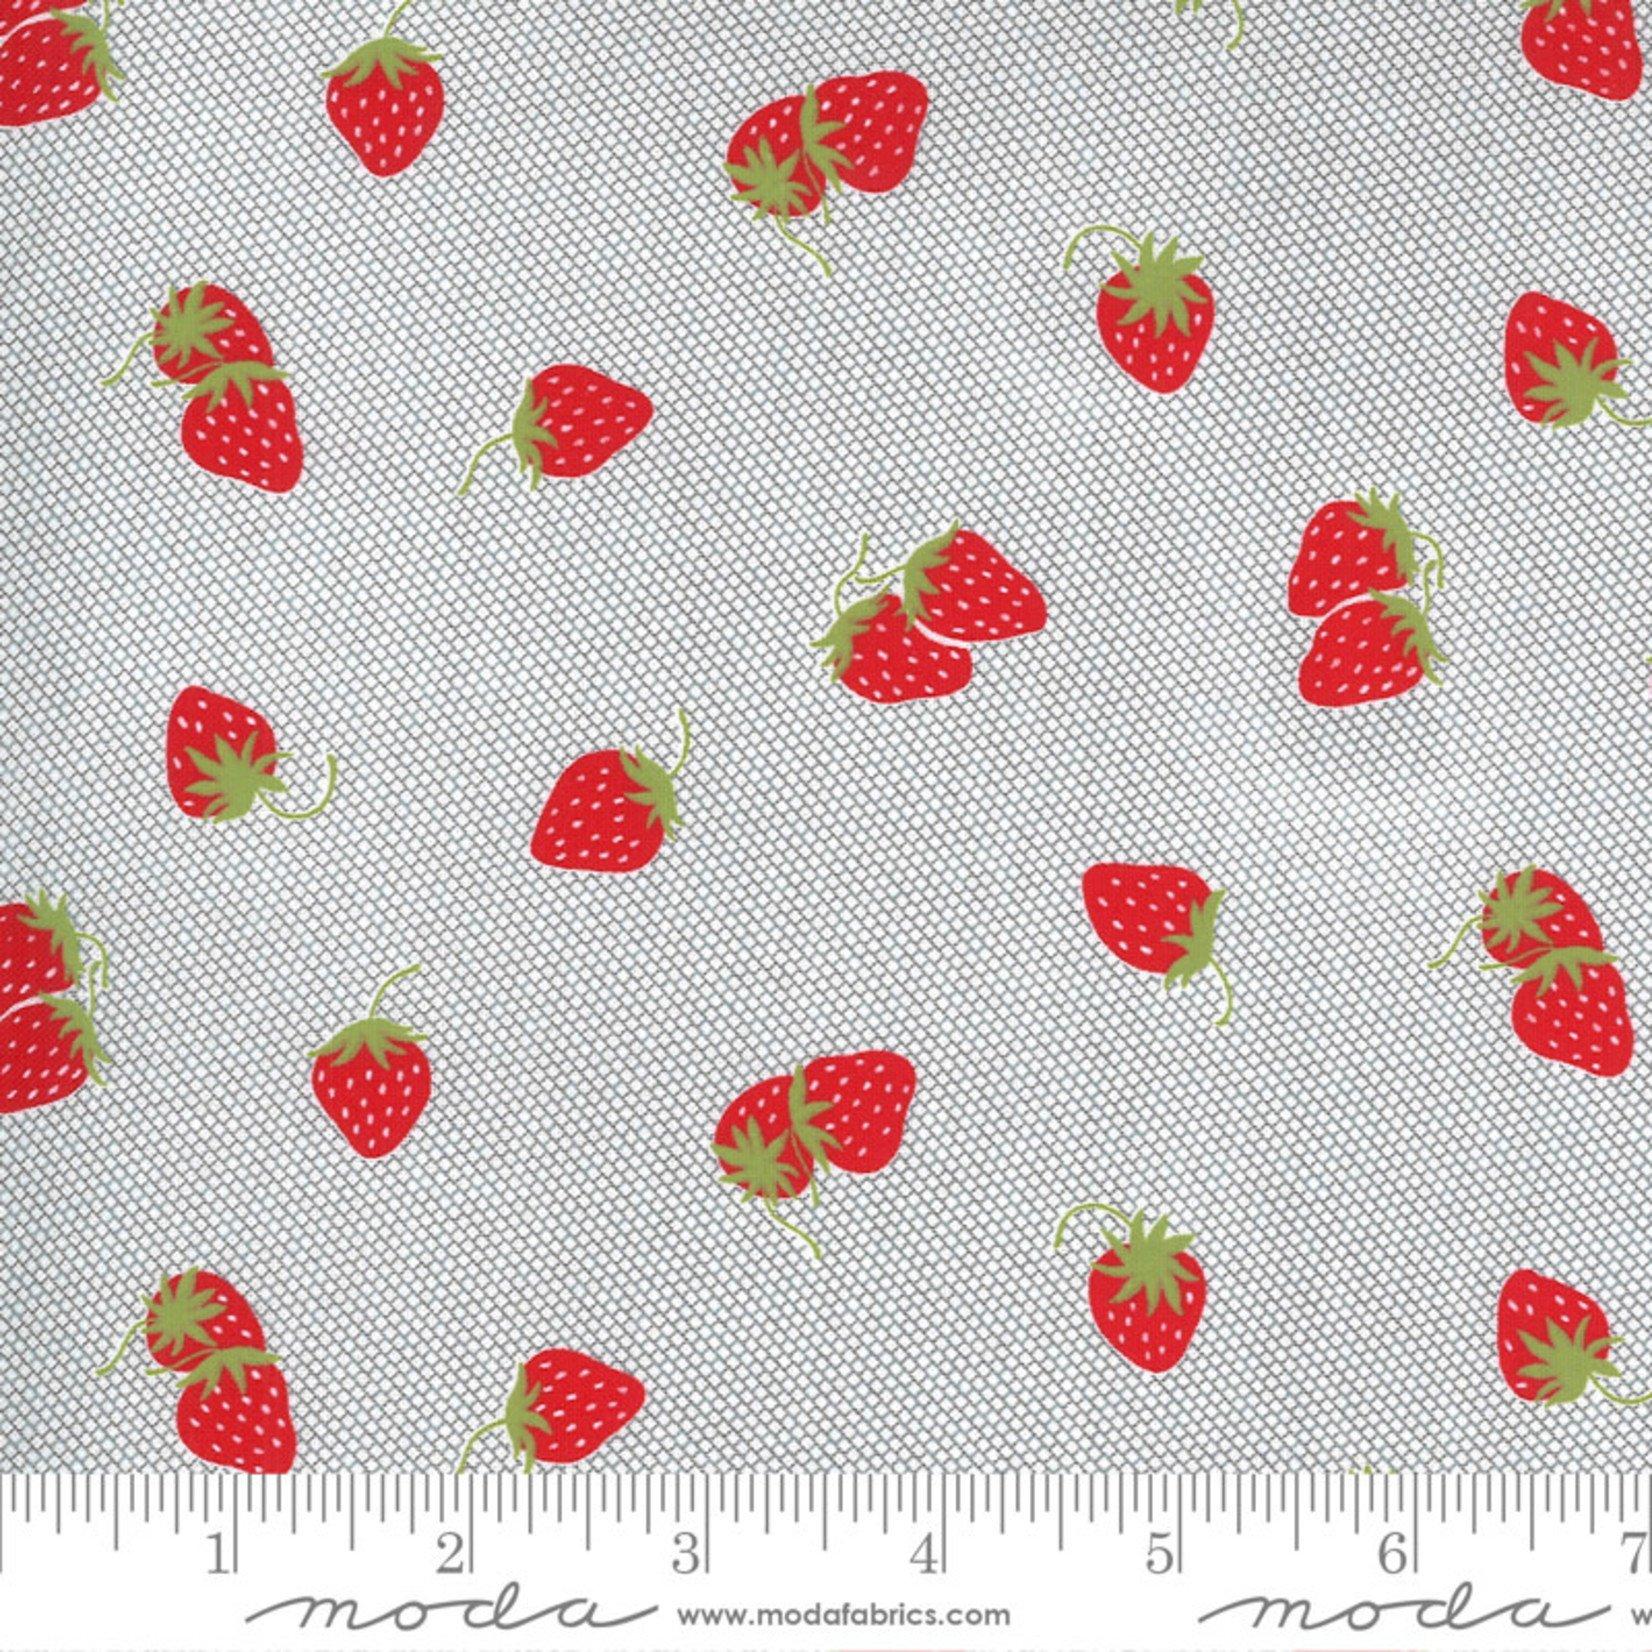 Bonnie & Camille Sunday Stroll, Berry Patch, Grey 55223 17 $0.20 per cm or $20/m